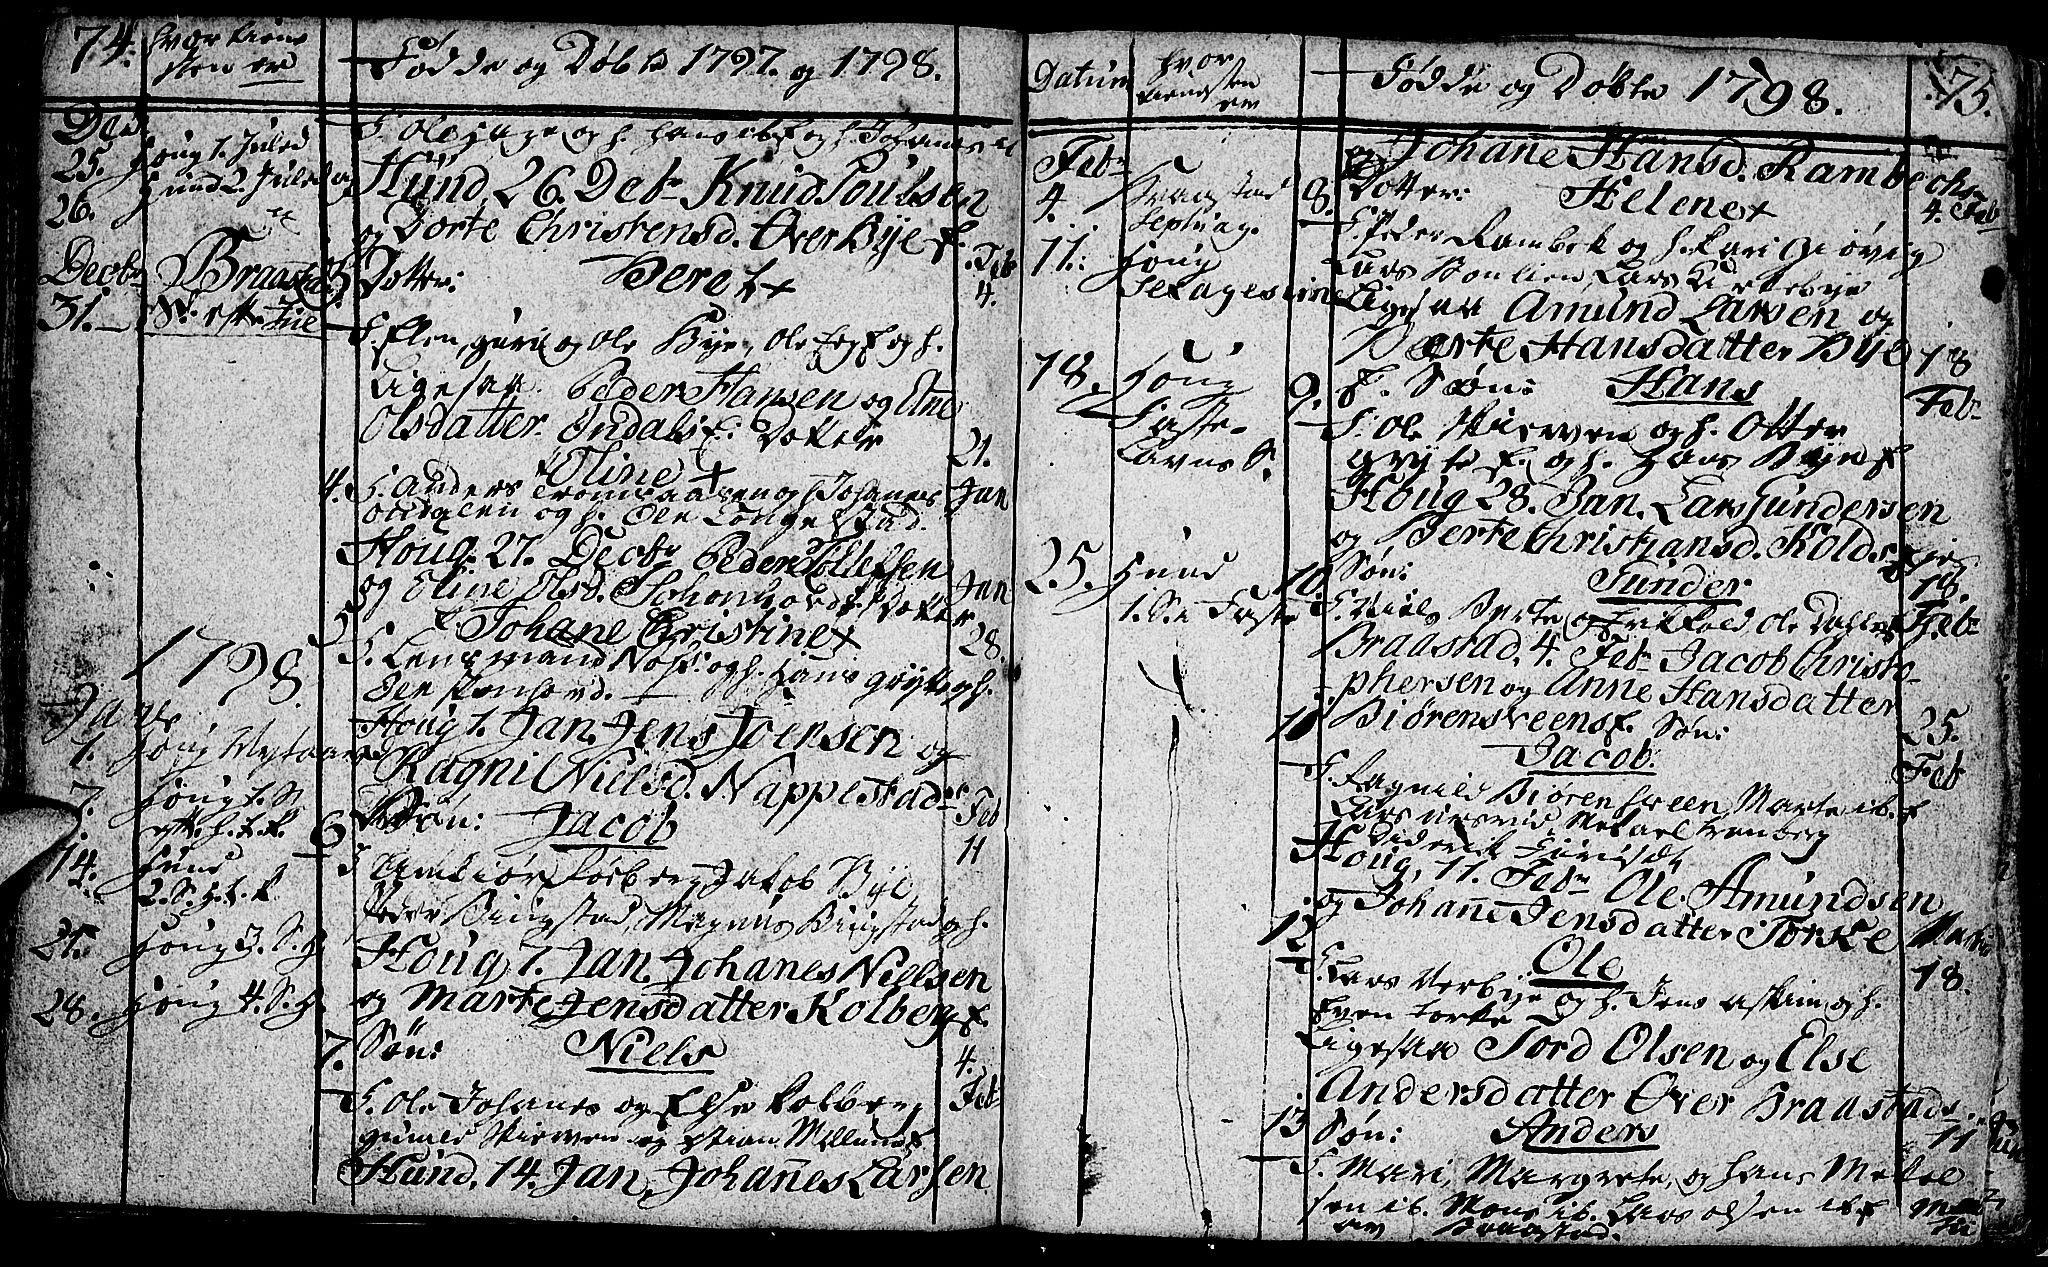 SAH, Vardal prestekontor, H/Ha/Hab/L0002: Klokkerbok nr. 2, 1790-1803, s. 74-75